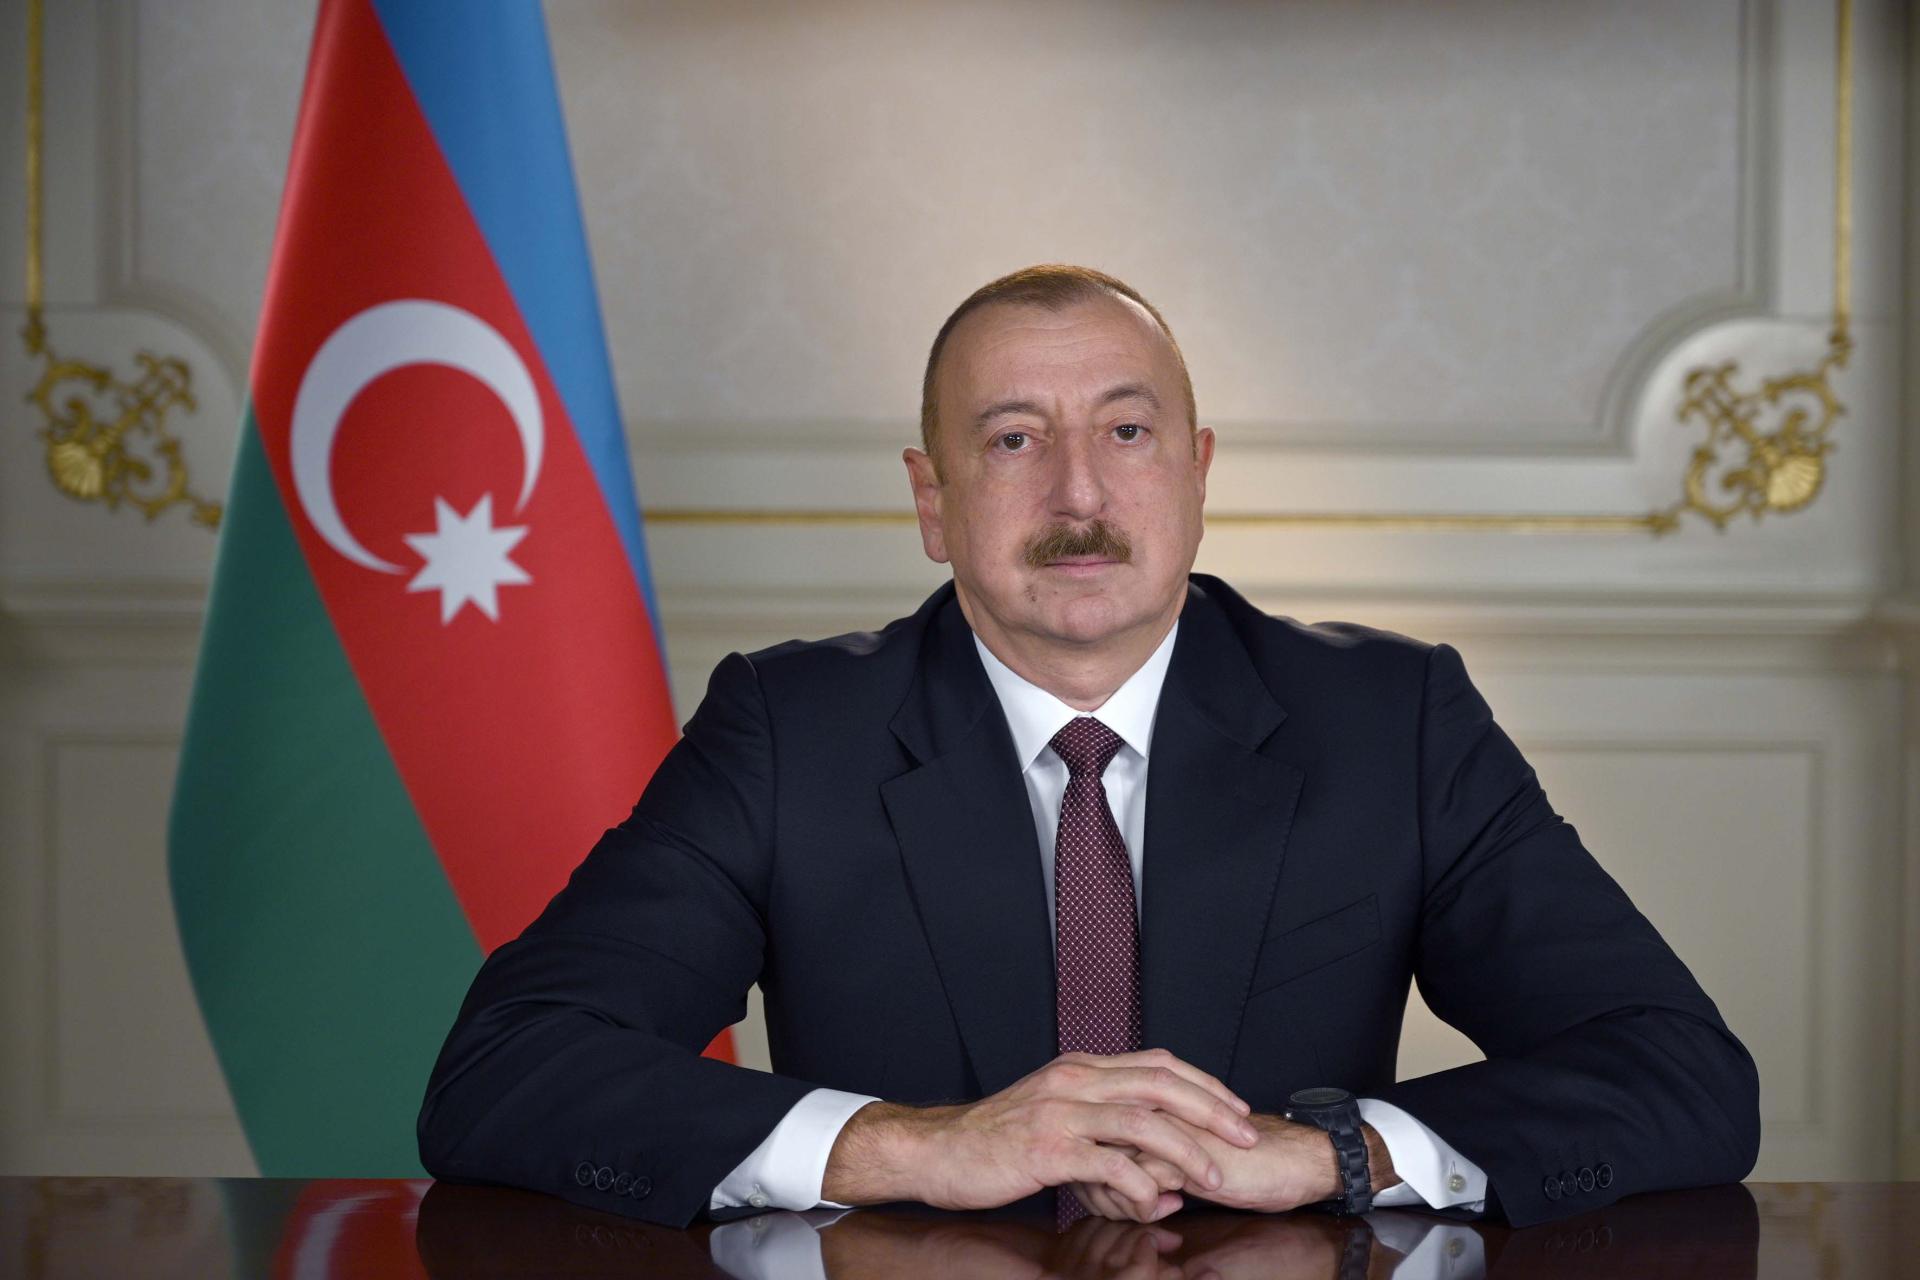 2020/07/ilham_aliyev_main_new_president_310120_1_1594632753.jpg